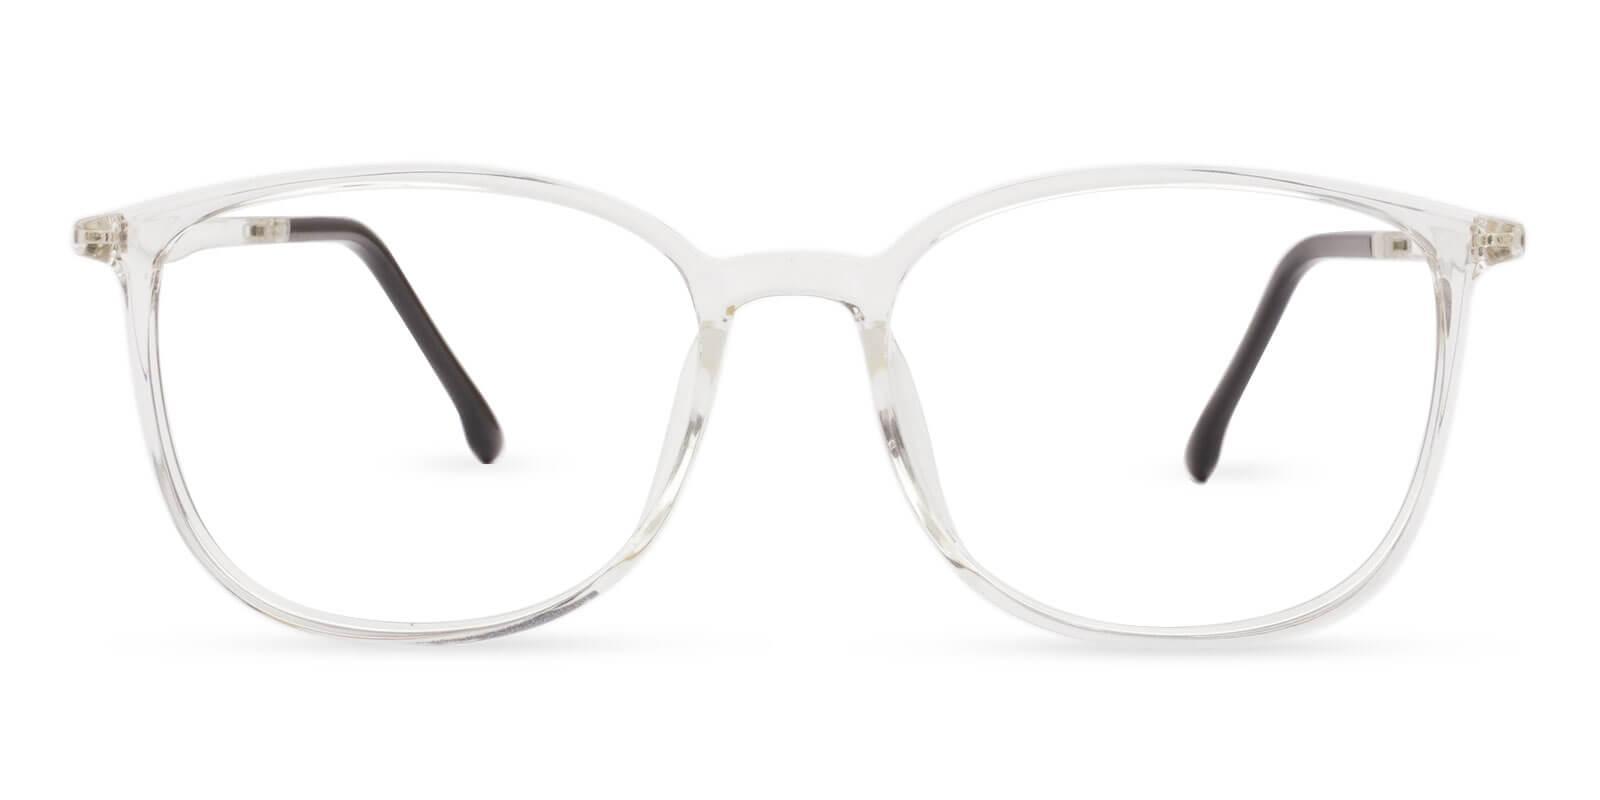 Leah Translucent TR Eyeglasses , Lightweight , UniversalBridgeFit Frames from ABBE Glasses